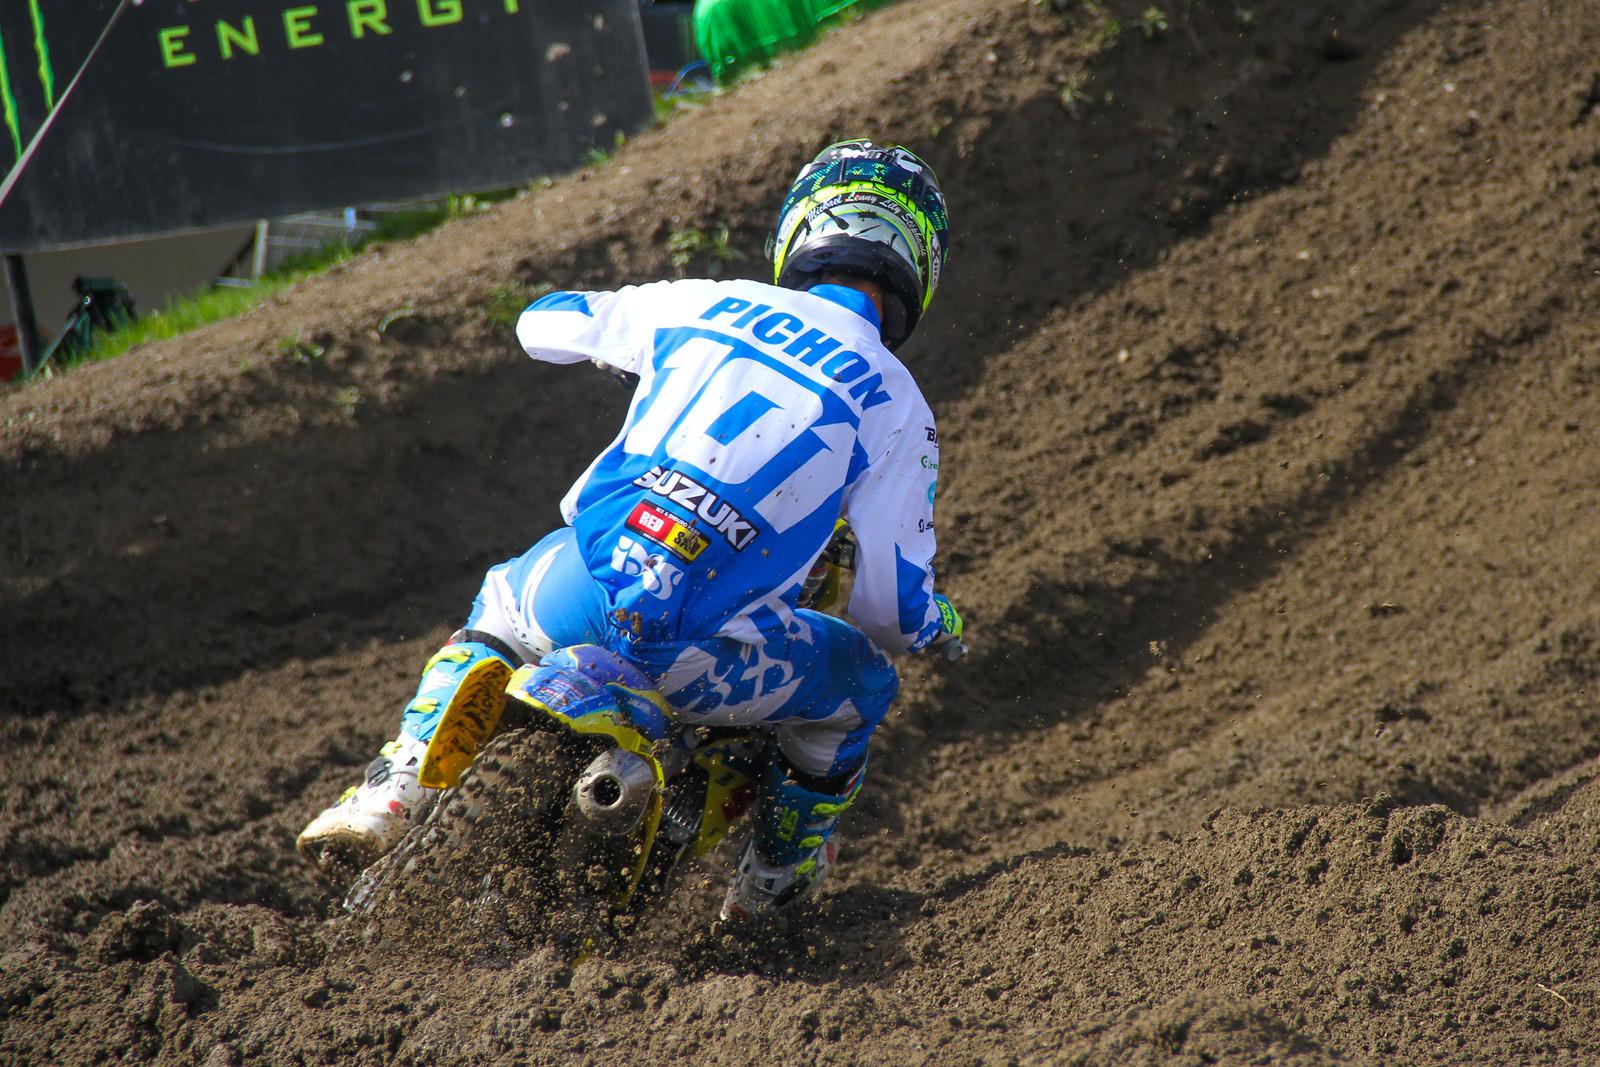 Zach Pichon - ayearinmx - Motocross Pictures - Vital MX